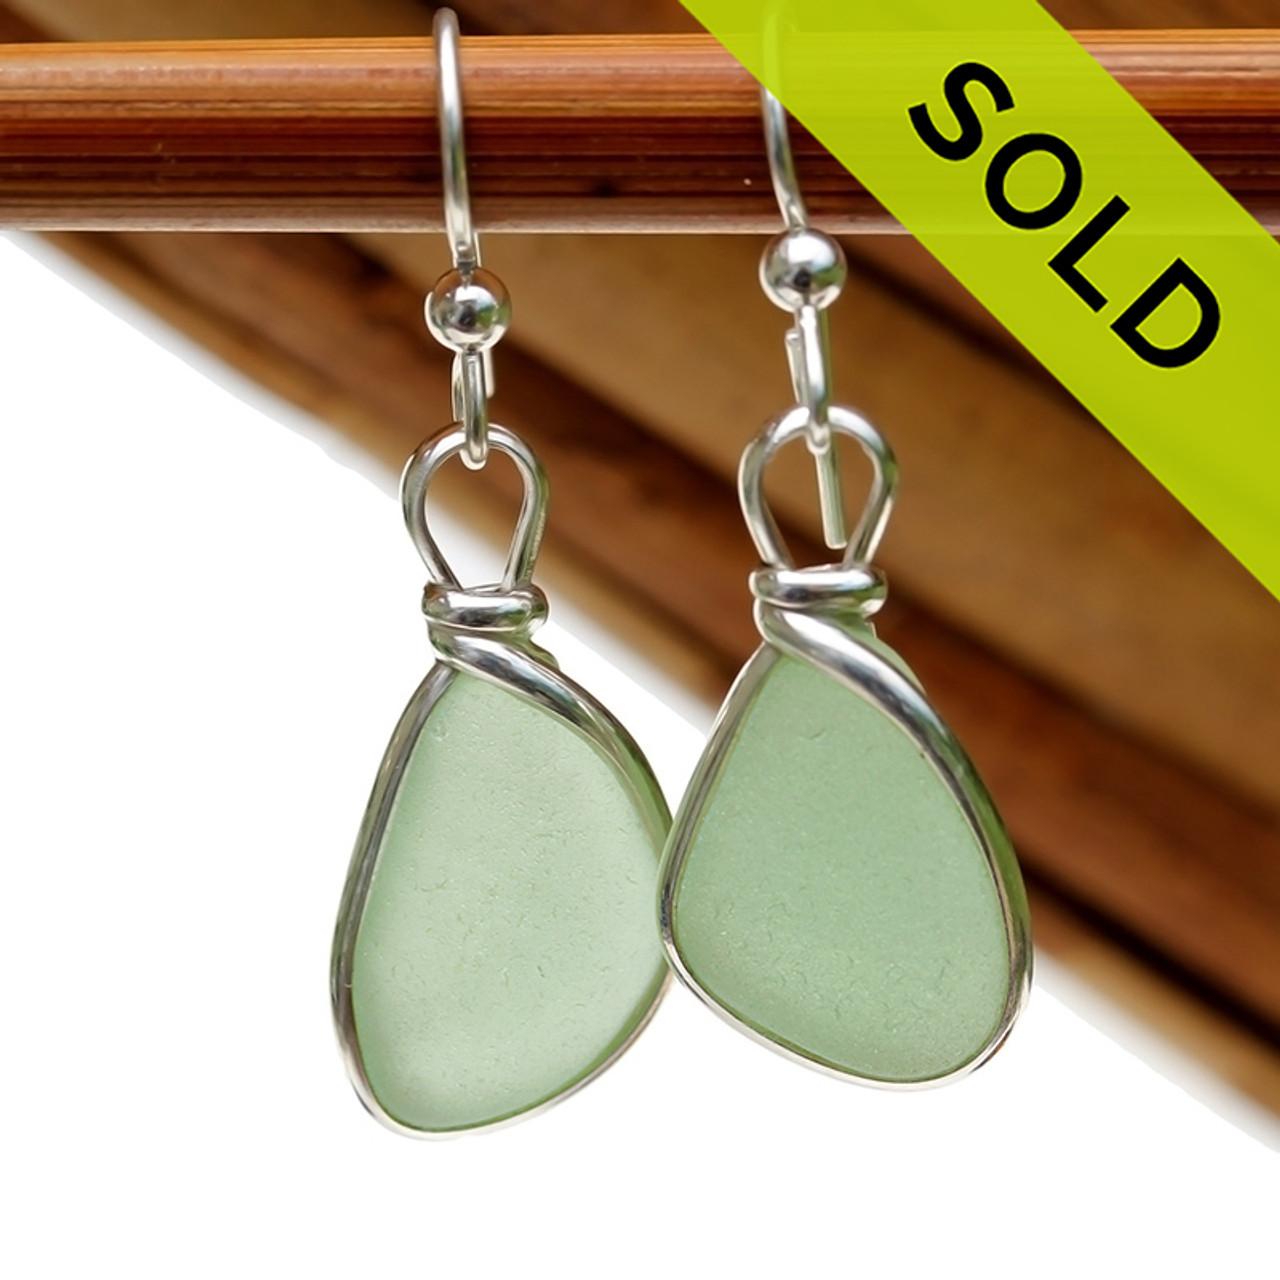 Sea Glass Gift Sea Glass Jewelry Sea Glass Earrings Beach Glass Earrings Puerto Rico Sea Glass Seafoam Sea Glass